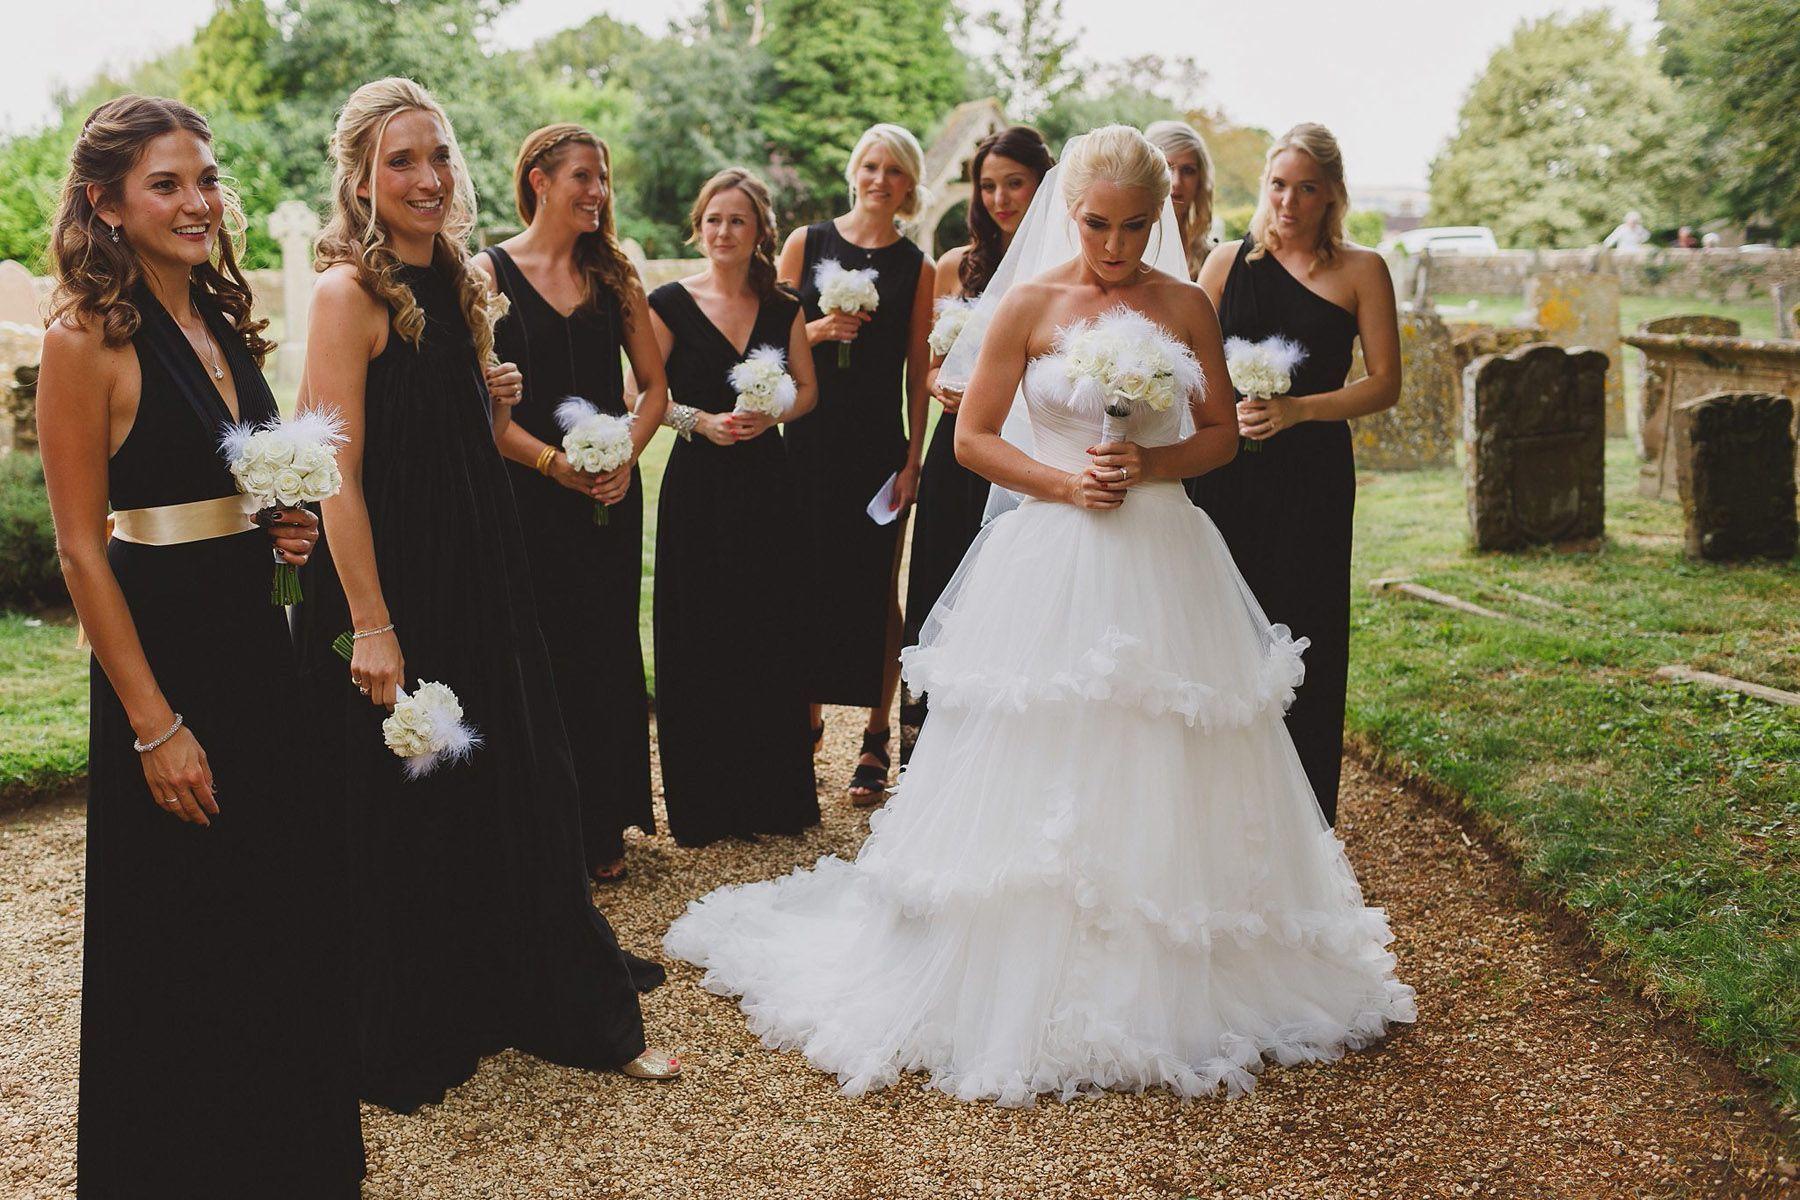 oxfordshire-wedding-photographer-027